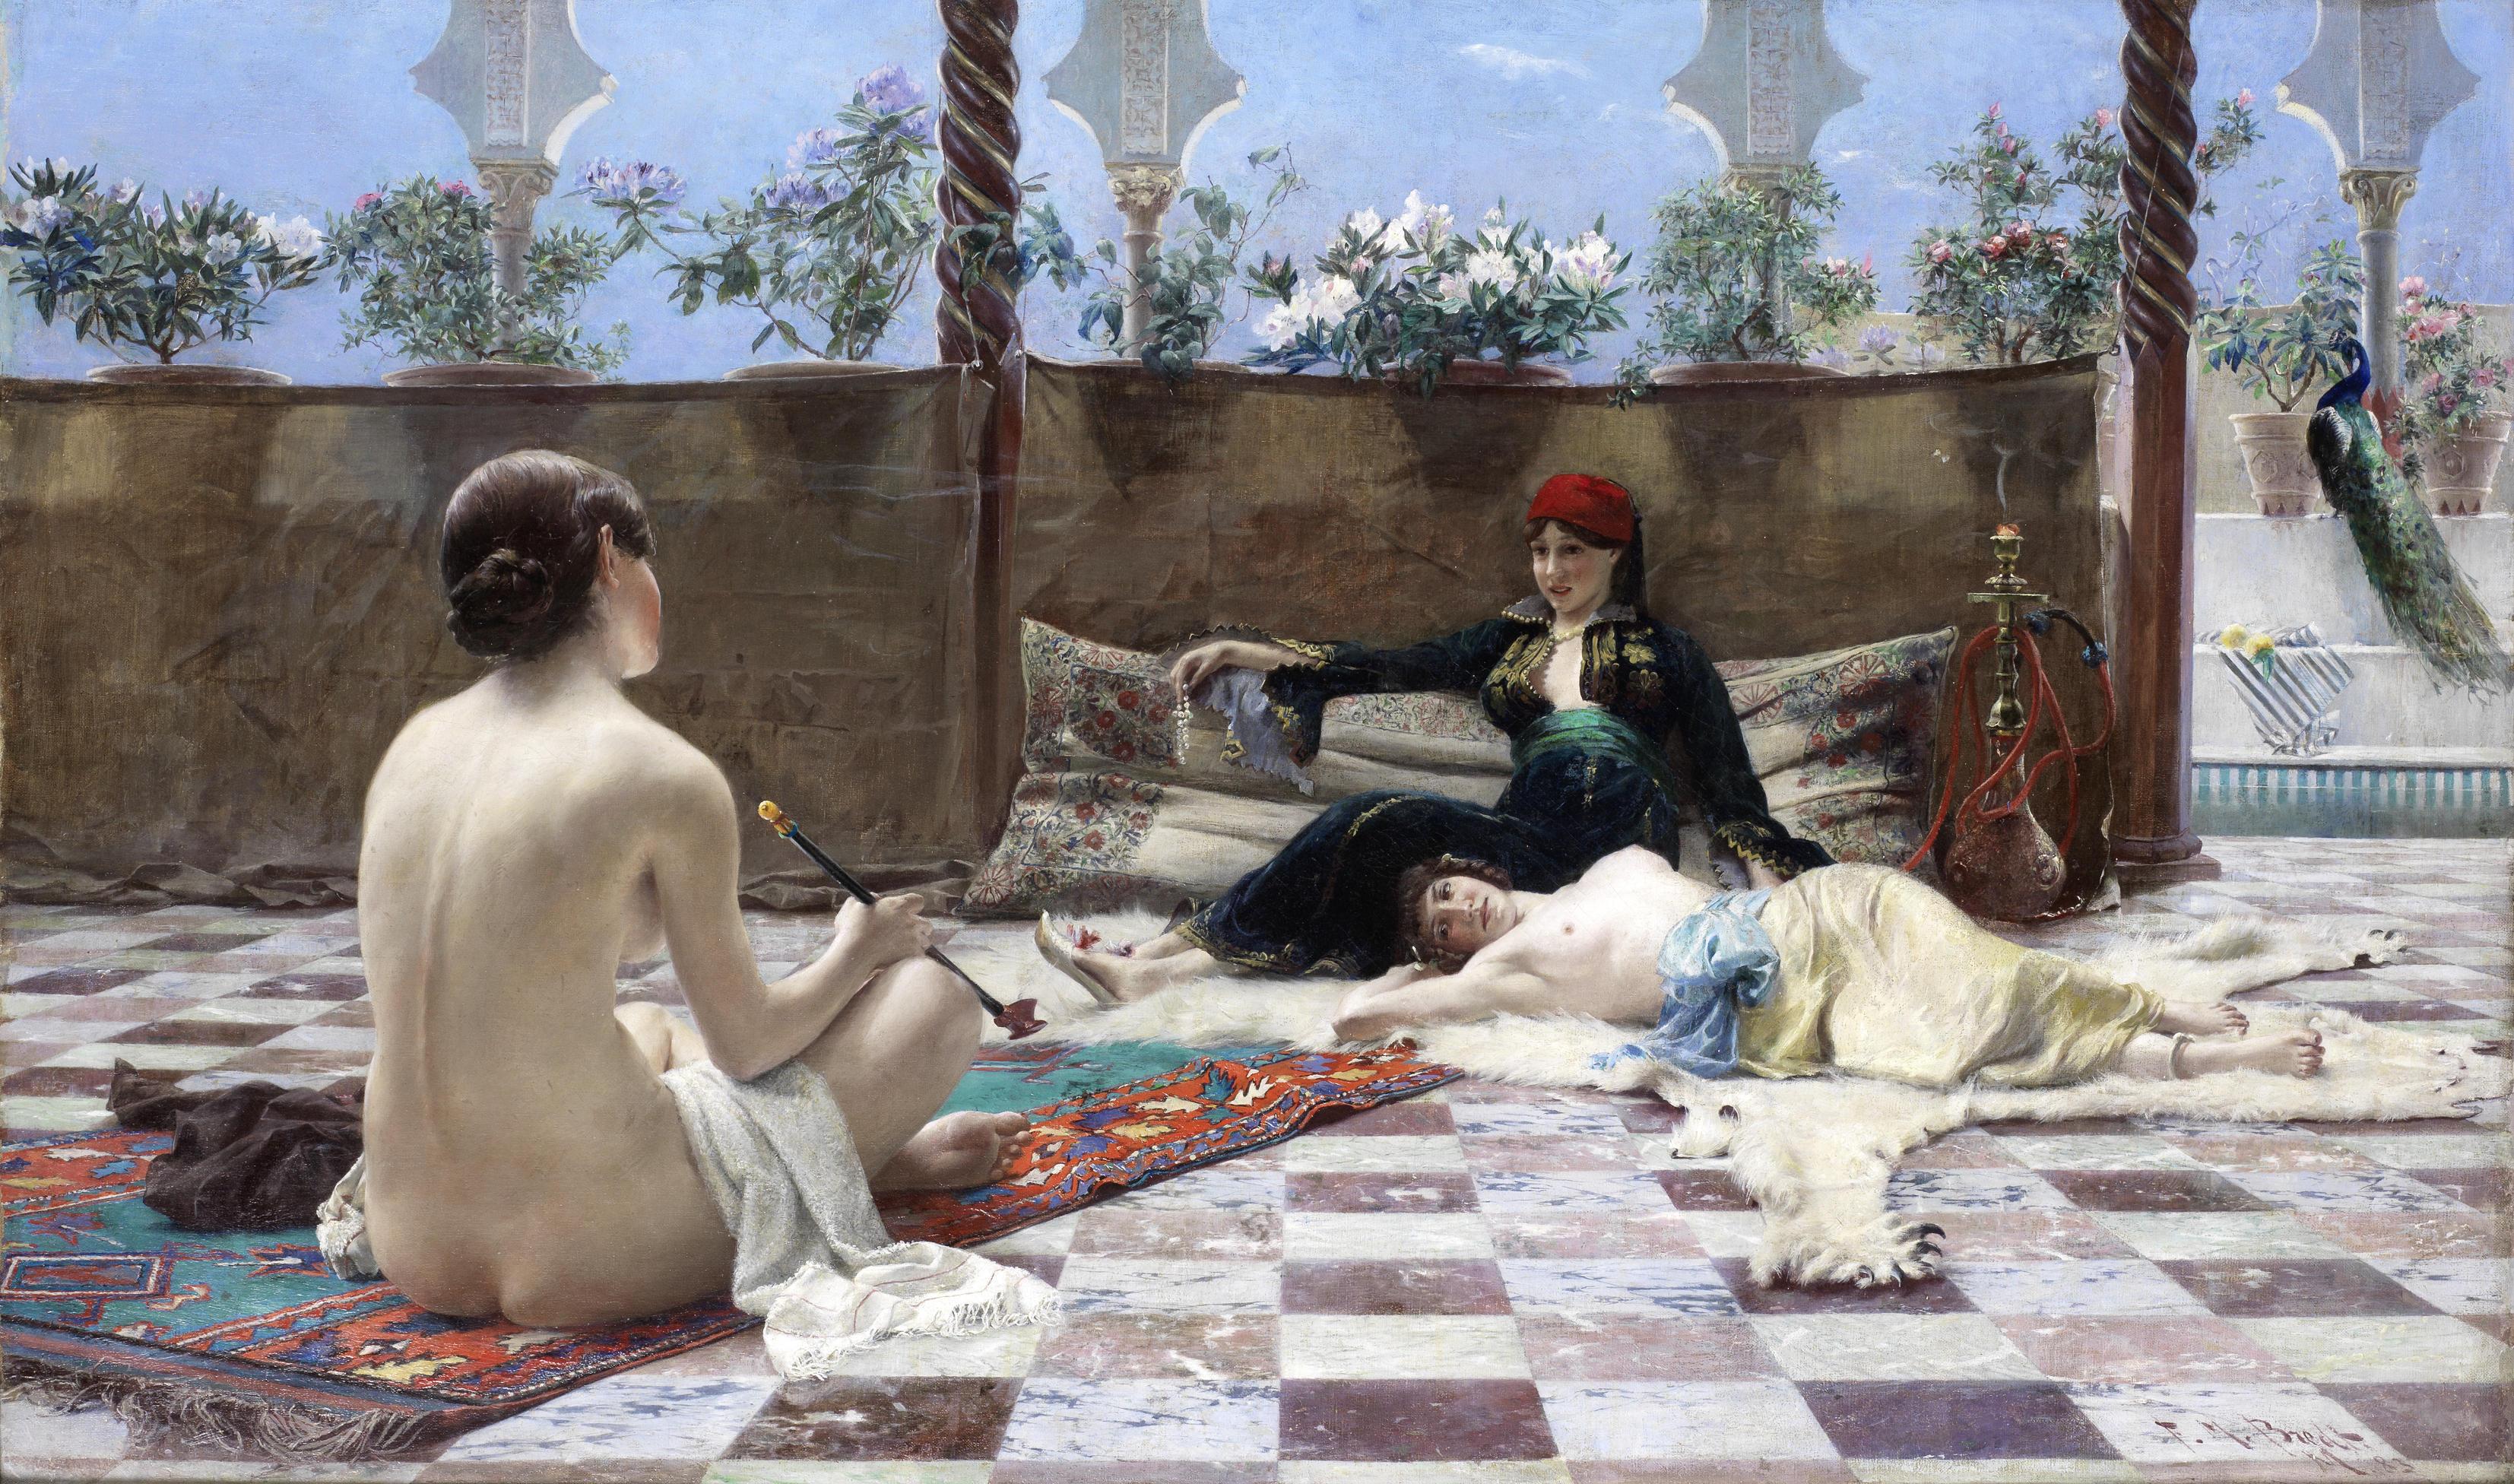 Ferdinand Max Bredt, 1868-1921. Турчанки. 1893. 60.5 x 100.5 см. Частная коллекция